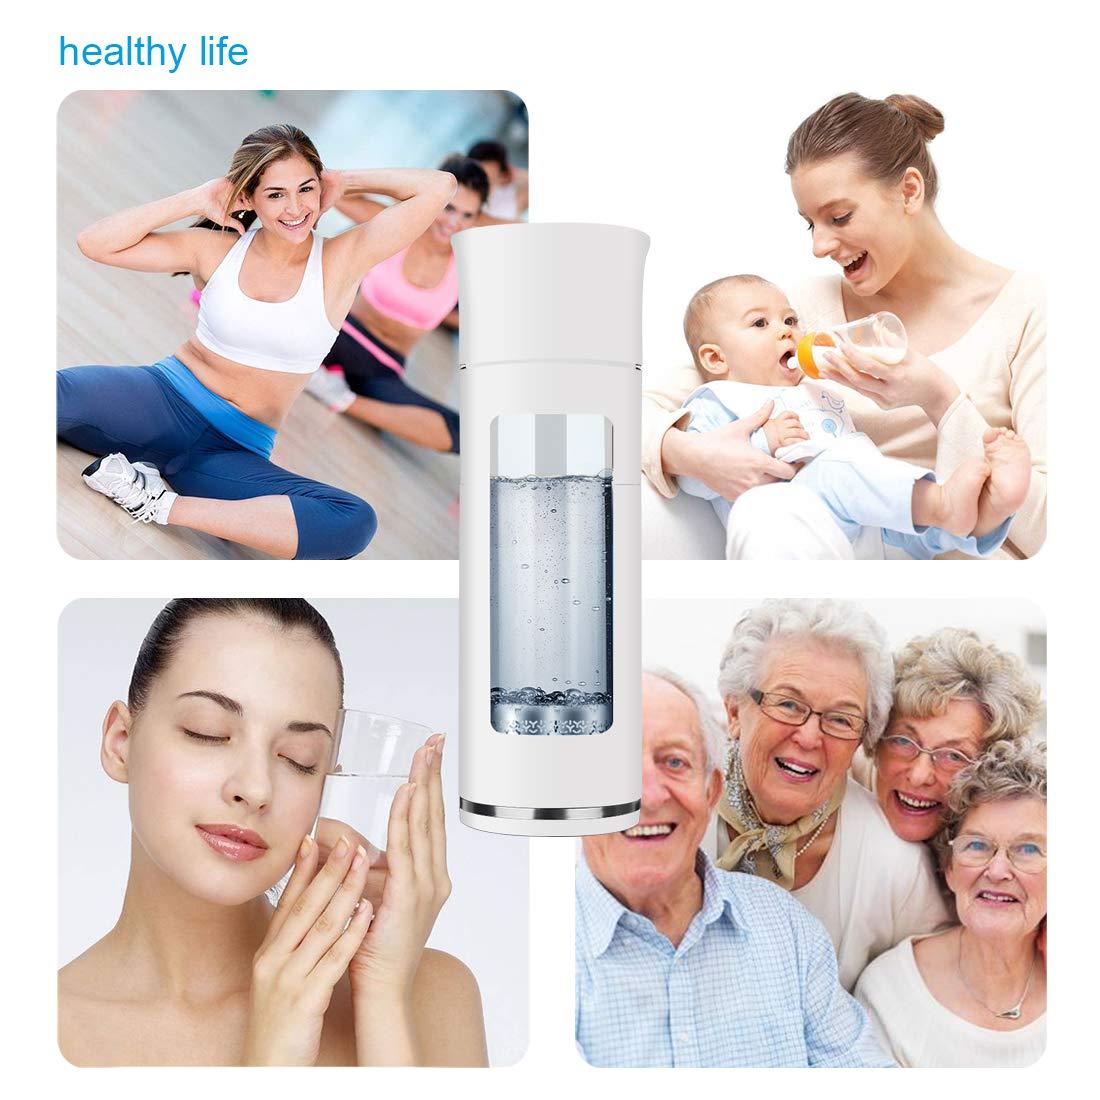 GOSOIT Hydrogen Alkaline Water Bottle Ionizer Hydrogen Water Maker Machine with Patent Hydrogen-enriched Tile Anti-Scald 15oz White